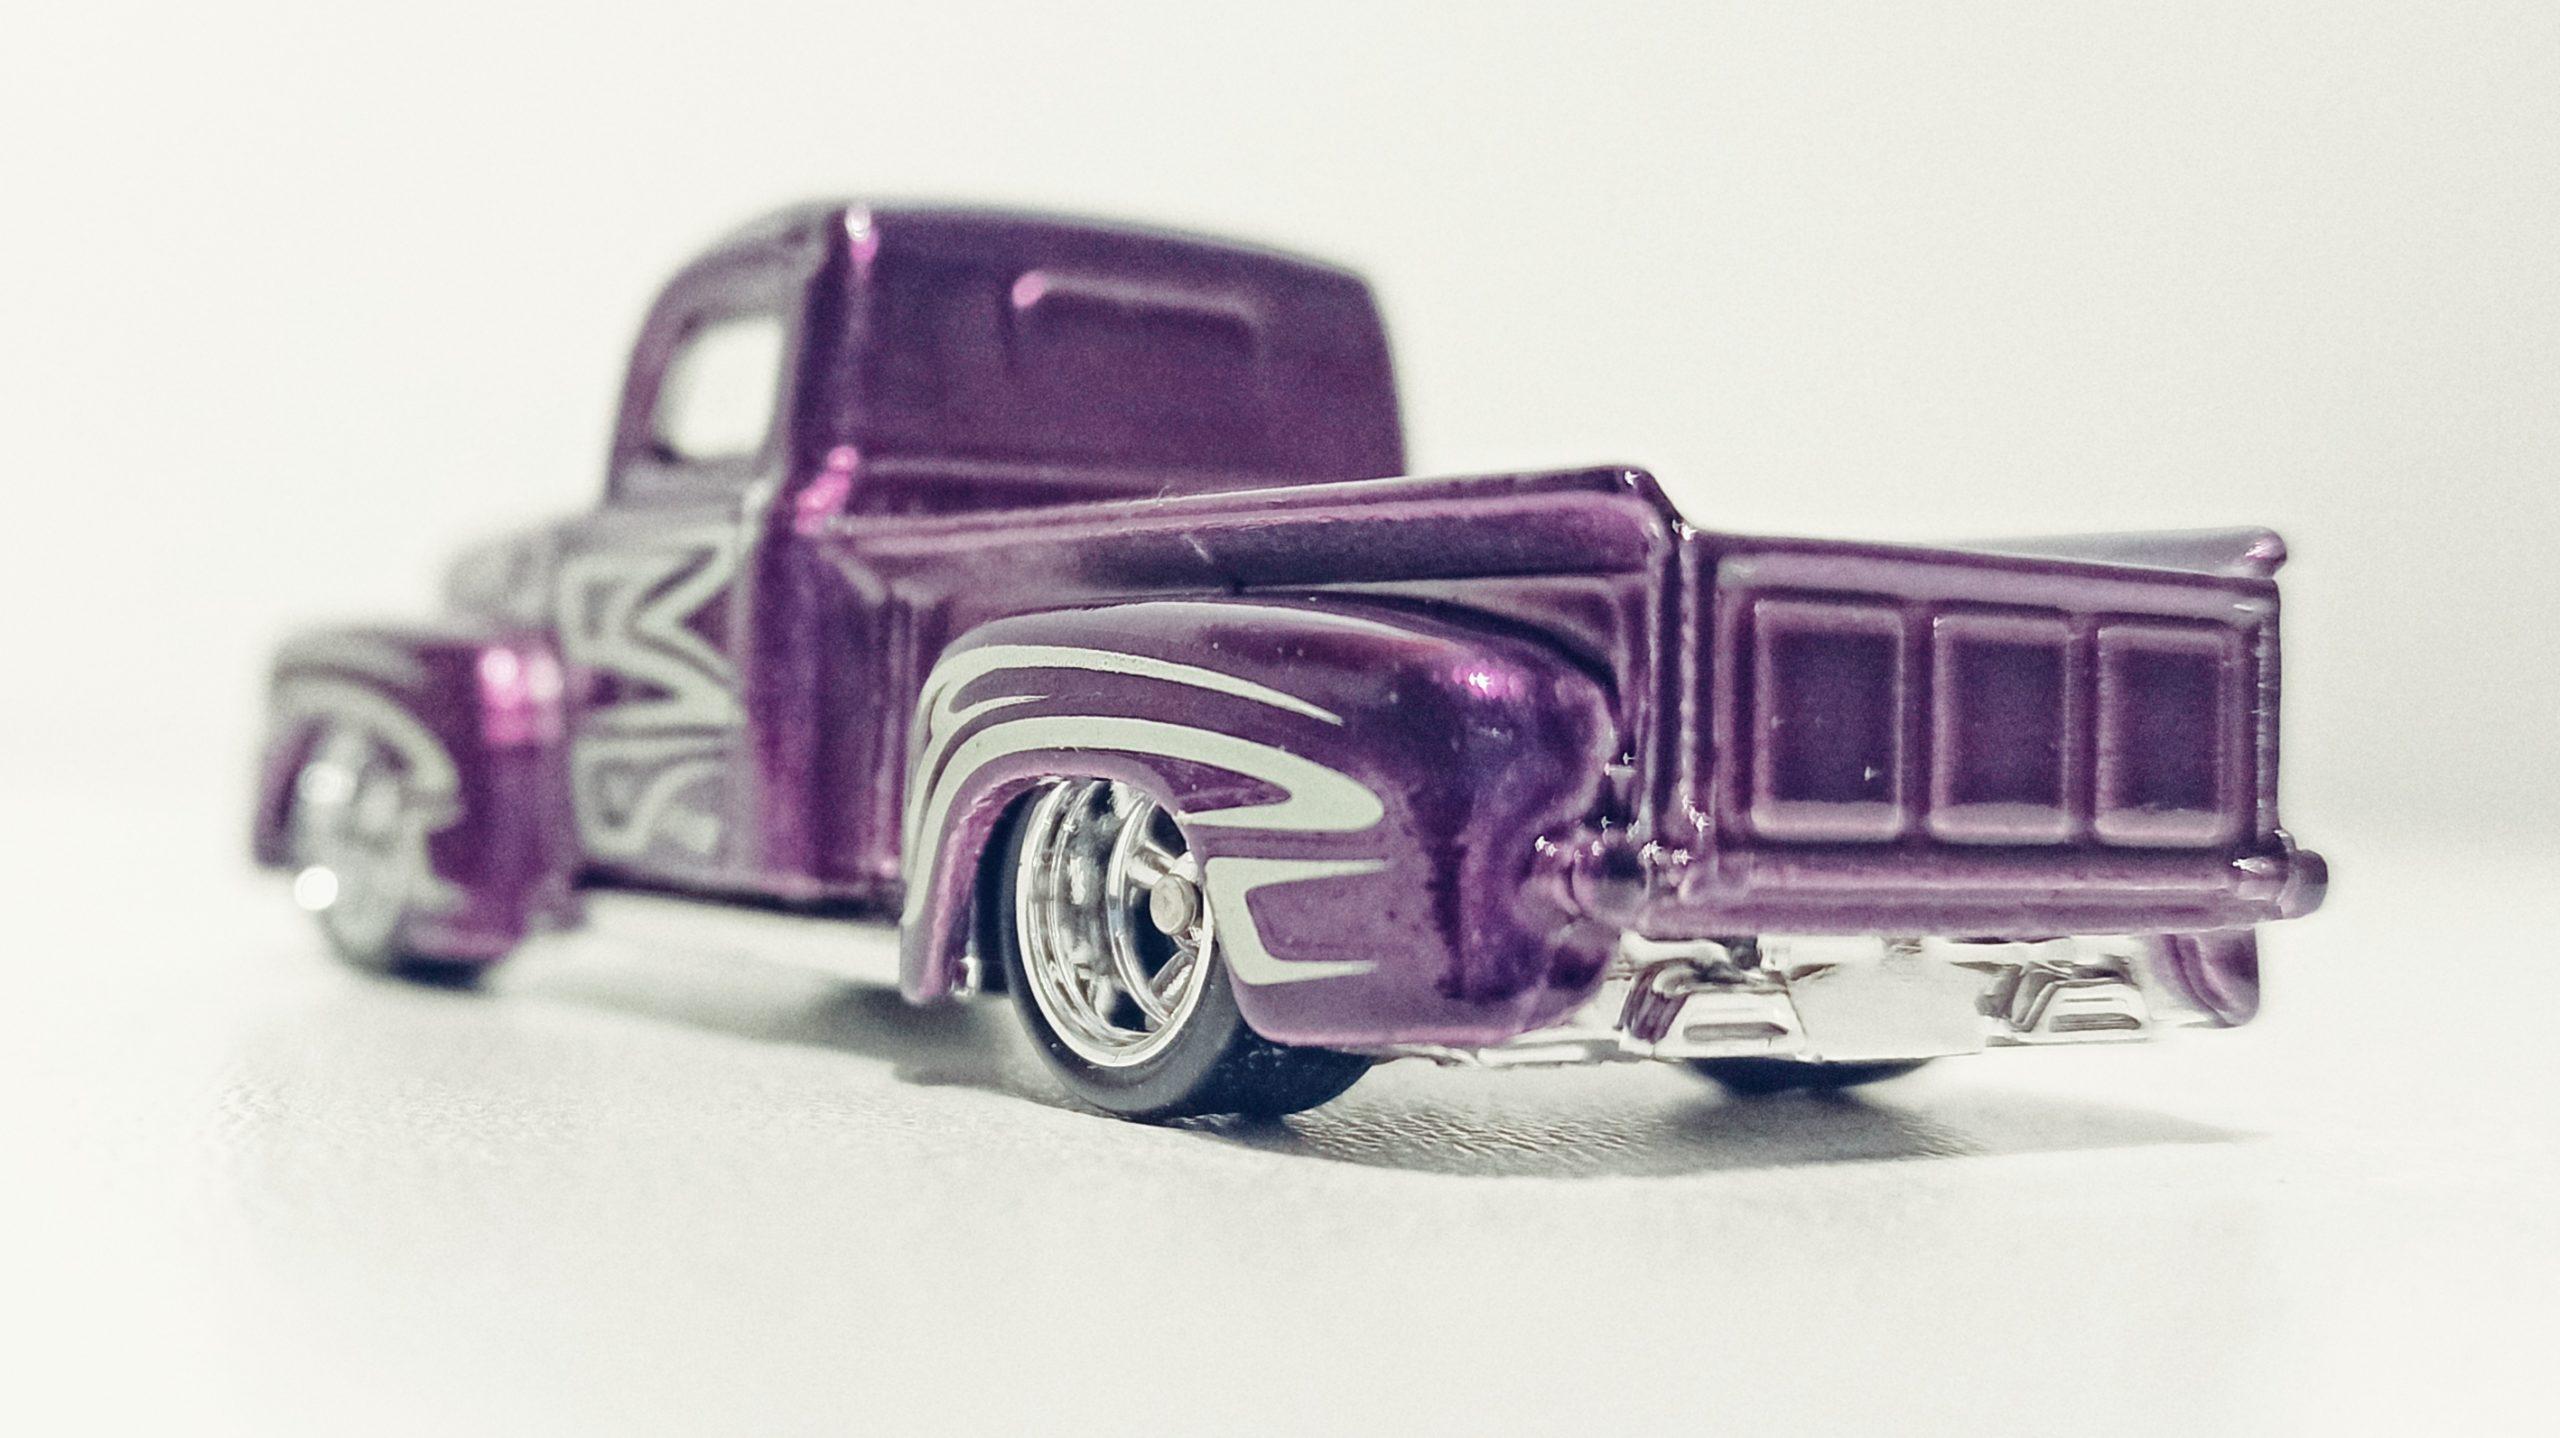 Hot Wheels '49 Ford F1 (GTD03) 2021 (225/250) HW Hot Trucks (6/10) spectraflame purple Super Treasure Hunt (STH) back angle